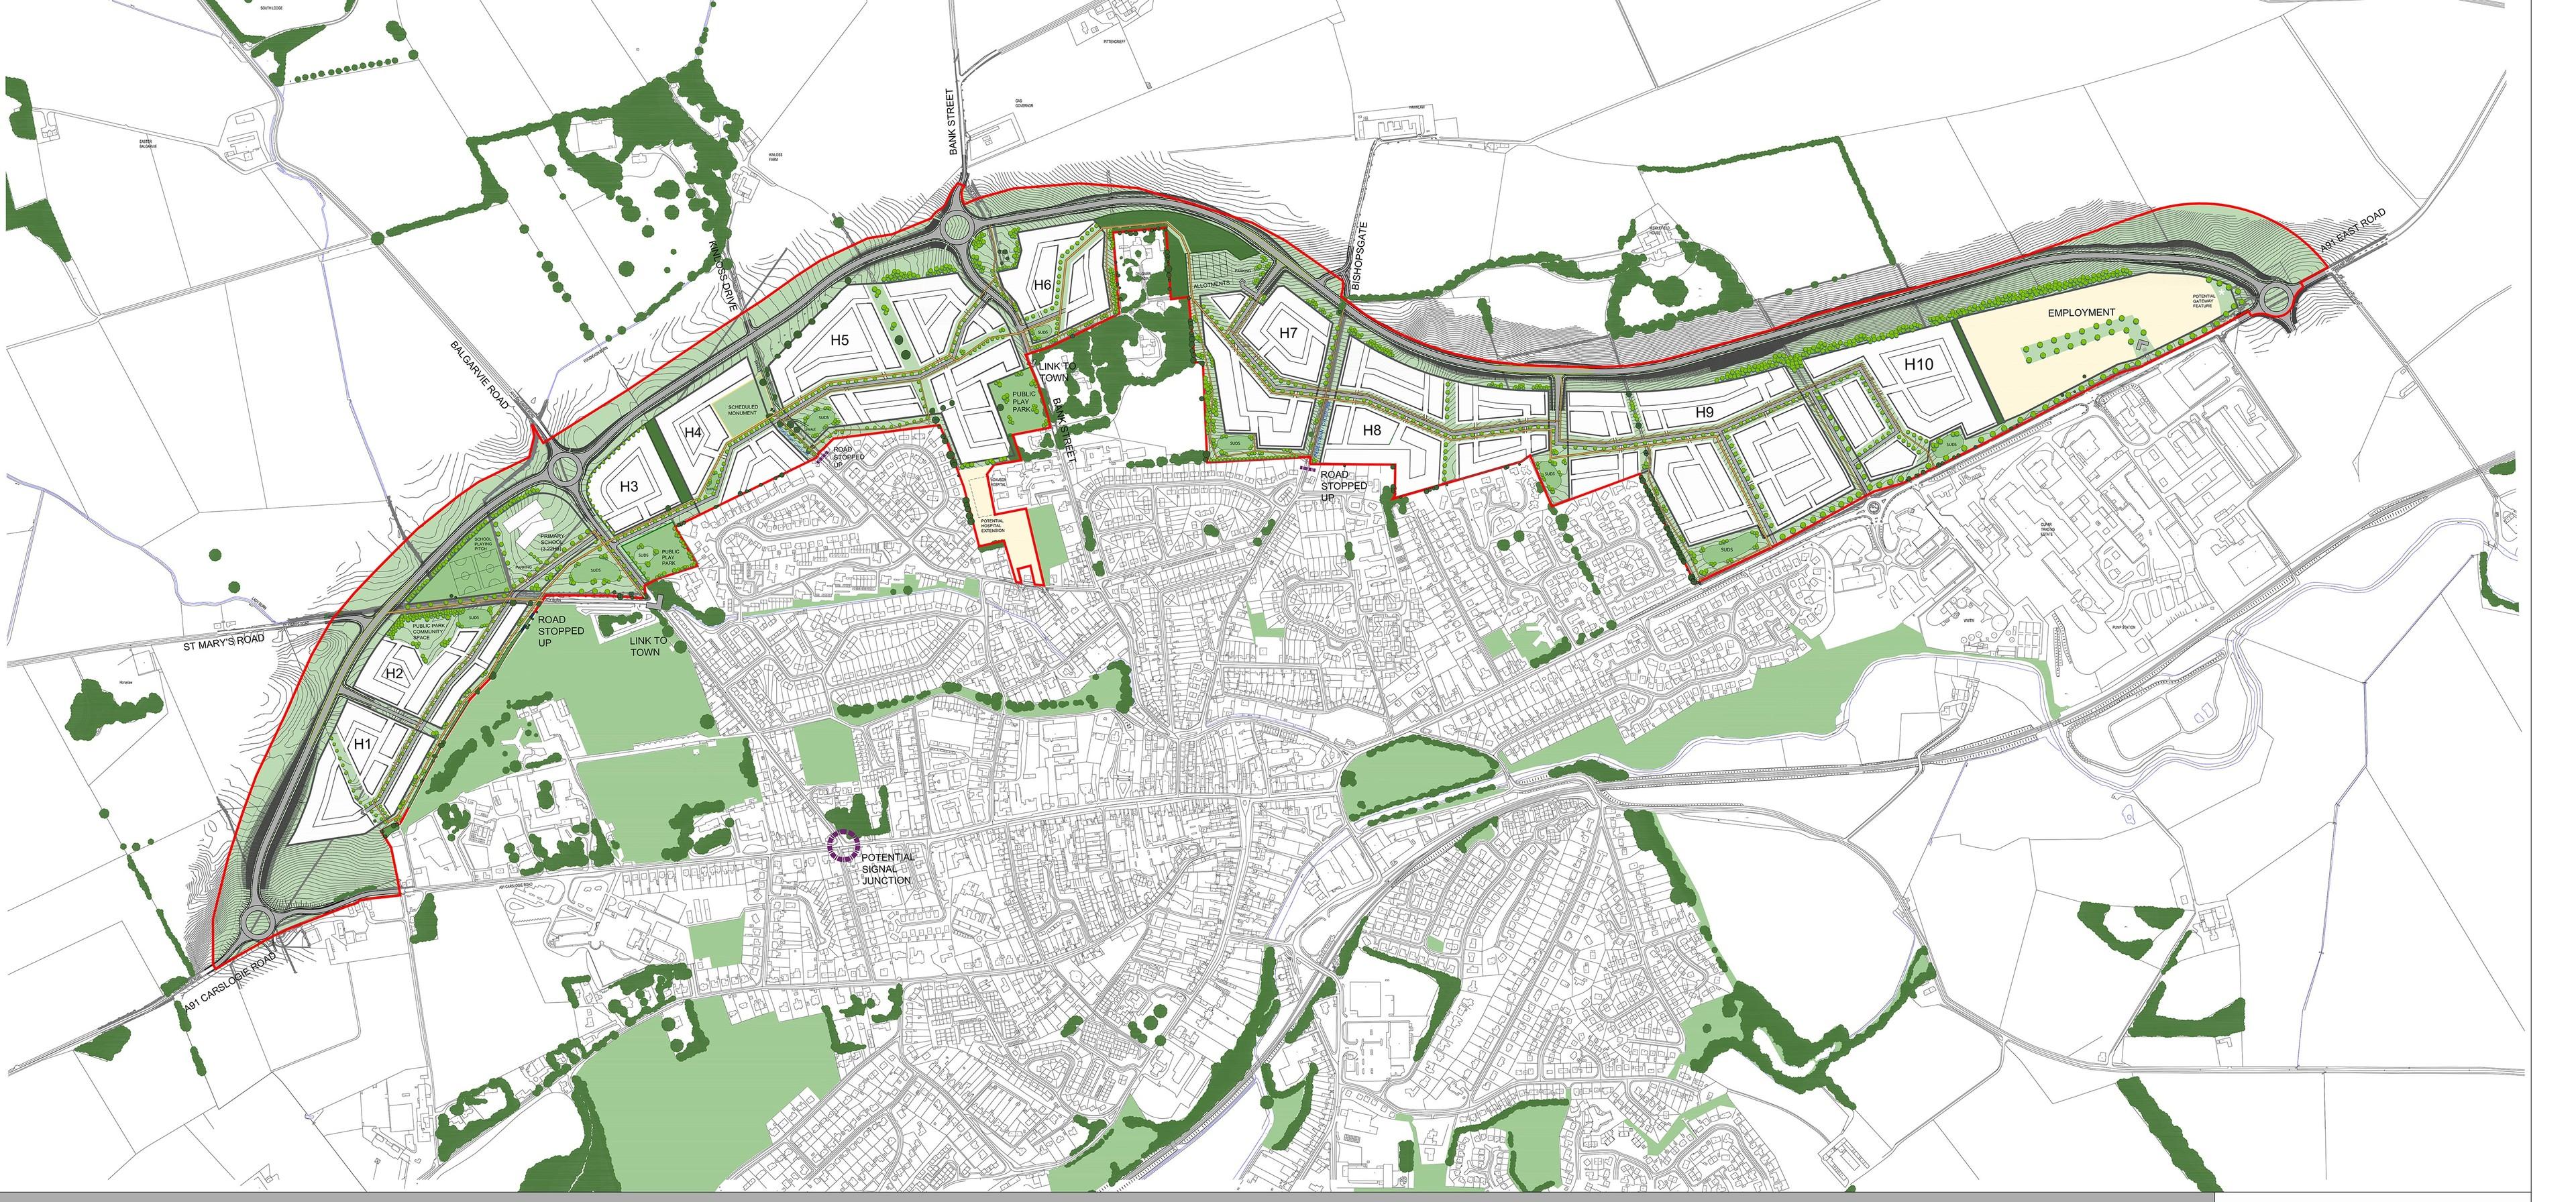 Plans for Cupar North.